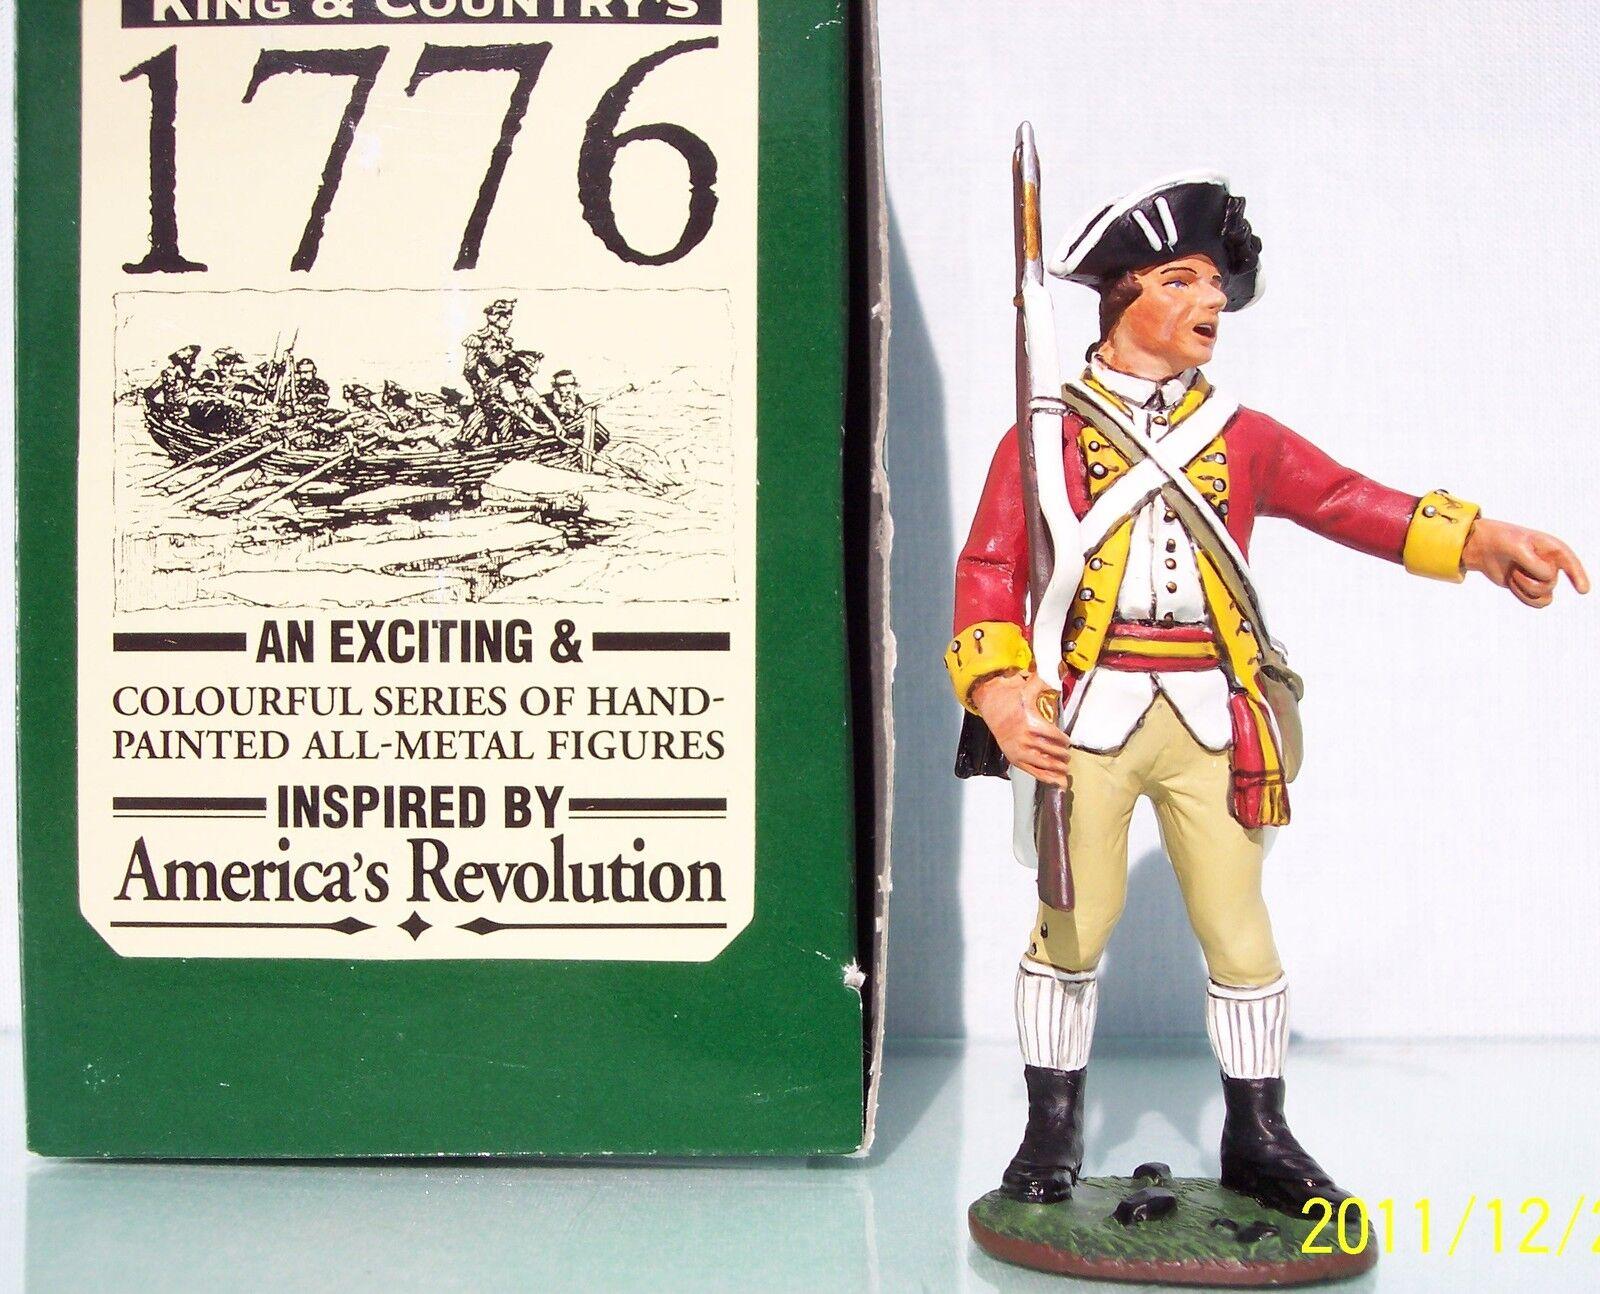 KING & COUNTRY BRITISH REVOLUTIONARY REVOLUTIONARY REVOLUTIONARY BR018 SERGEANT POINTING MIB 23fb93